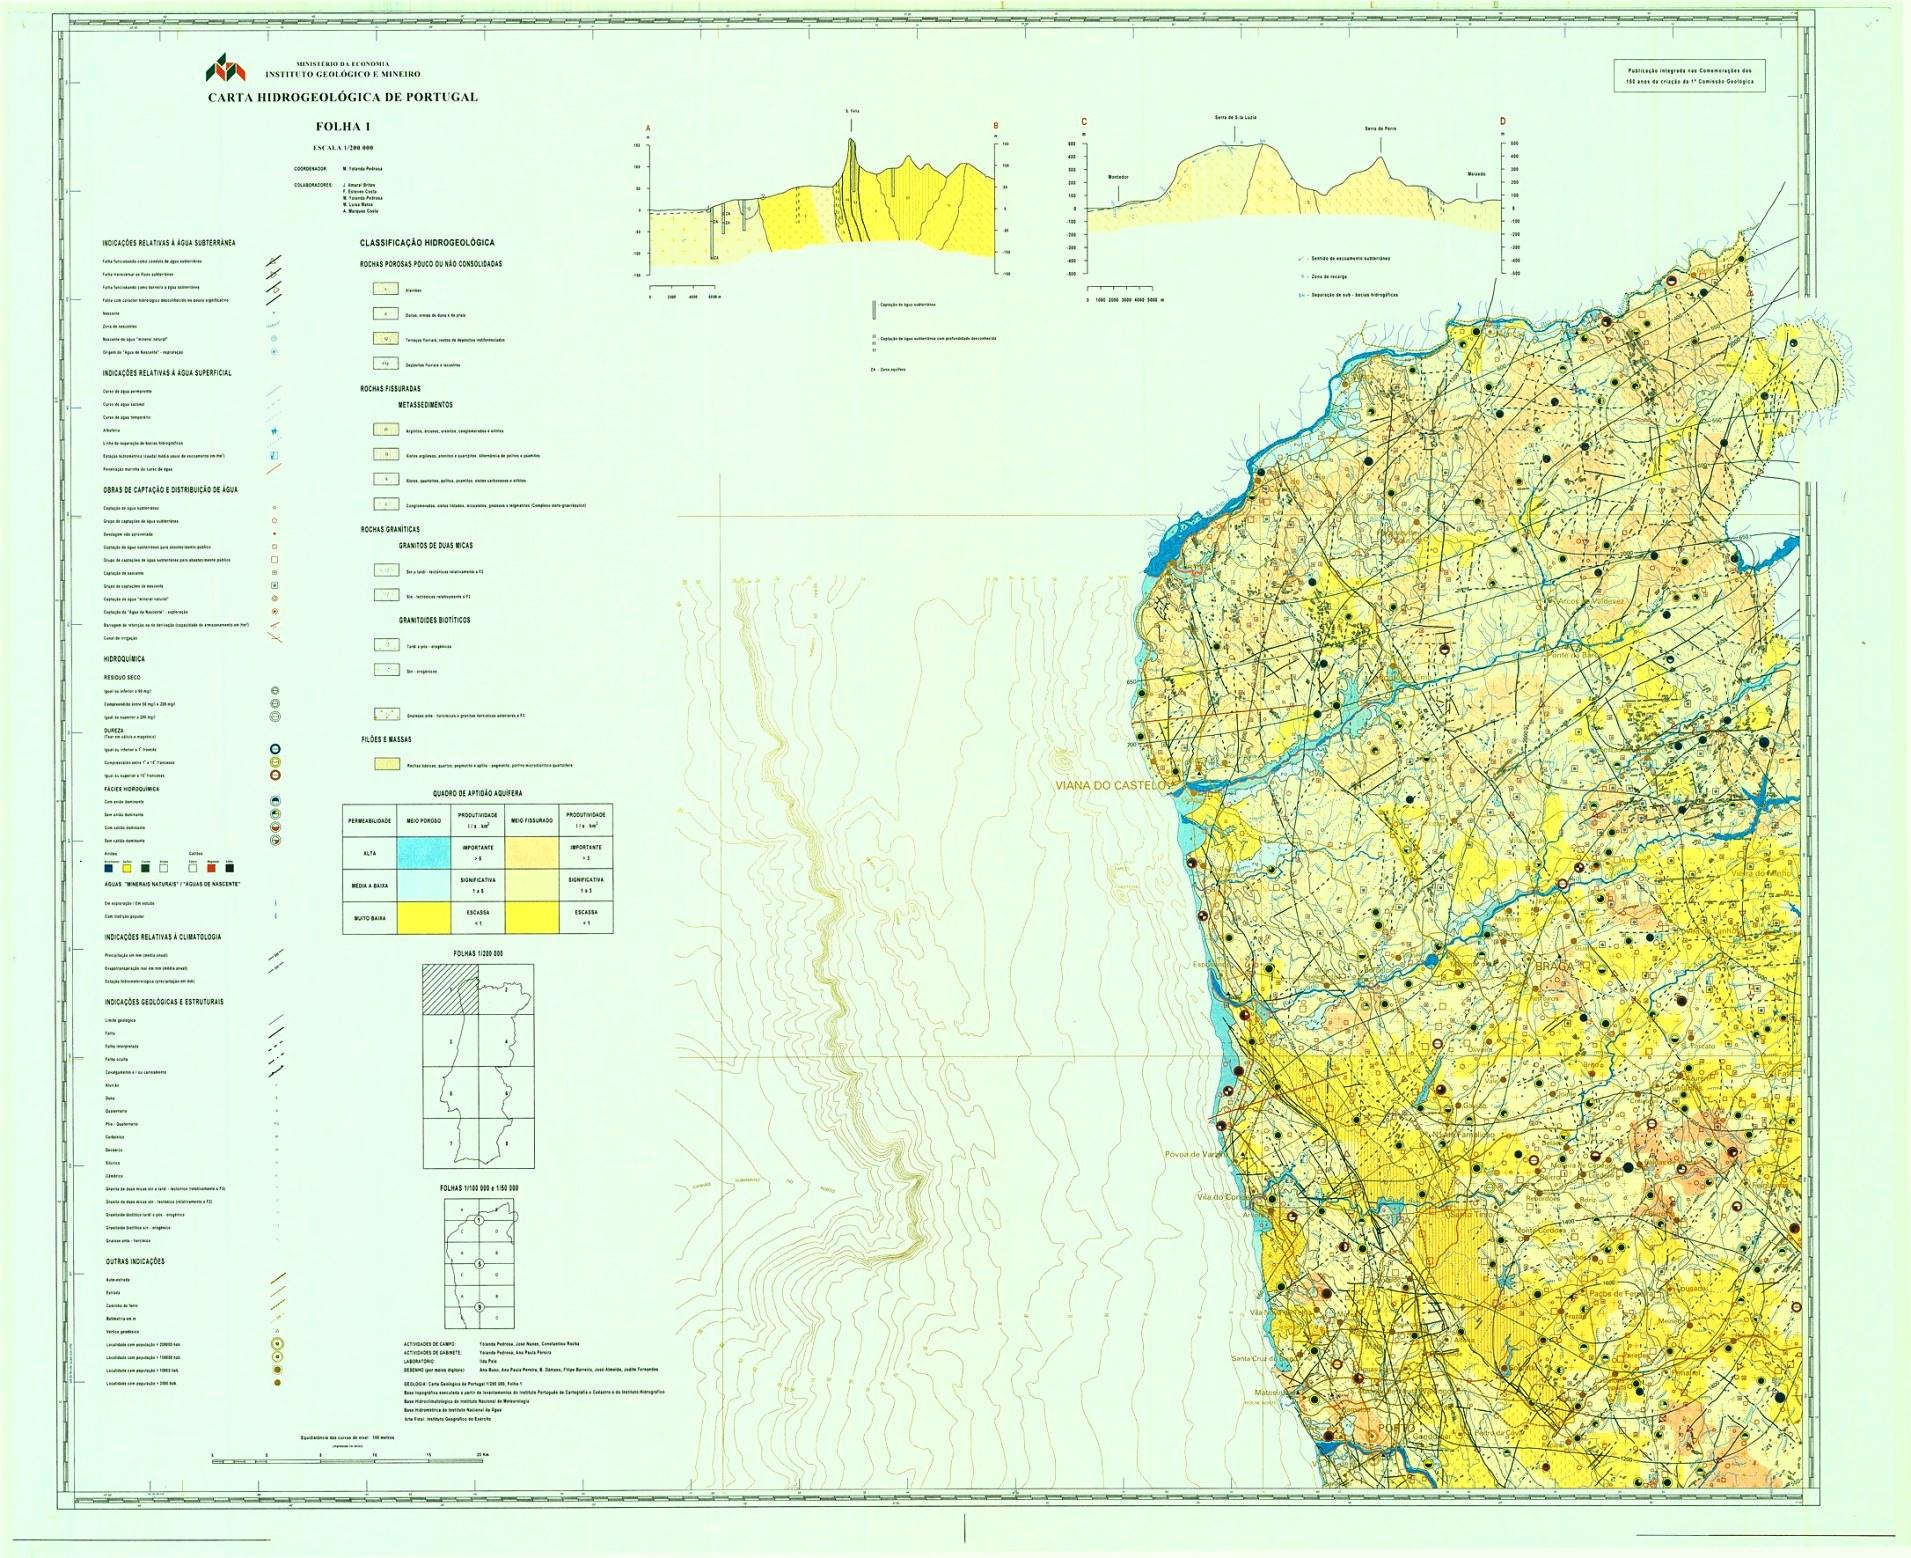 cartografia-hidrogeologica-de-portugal